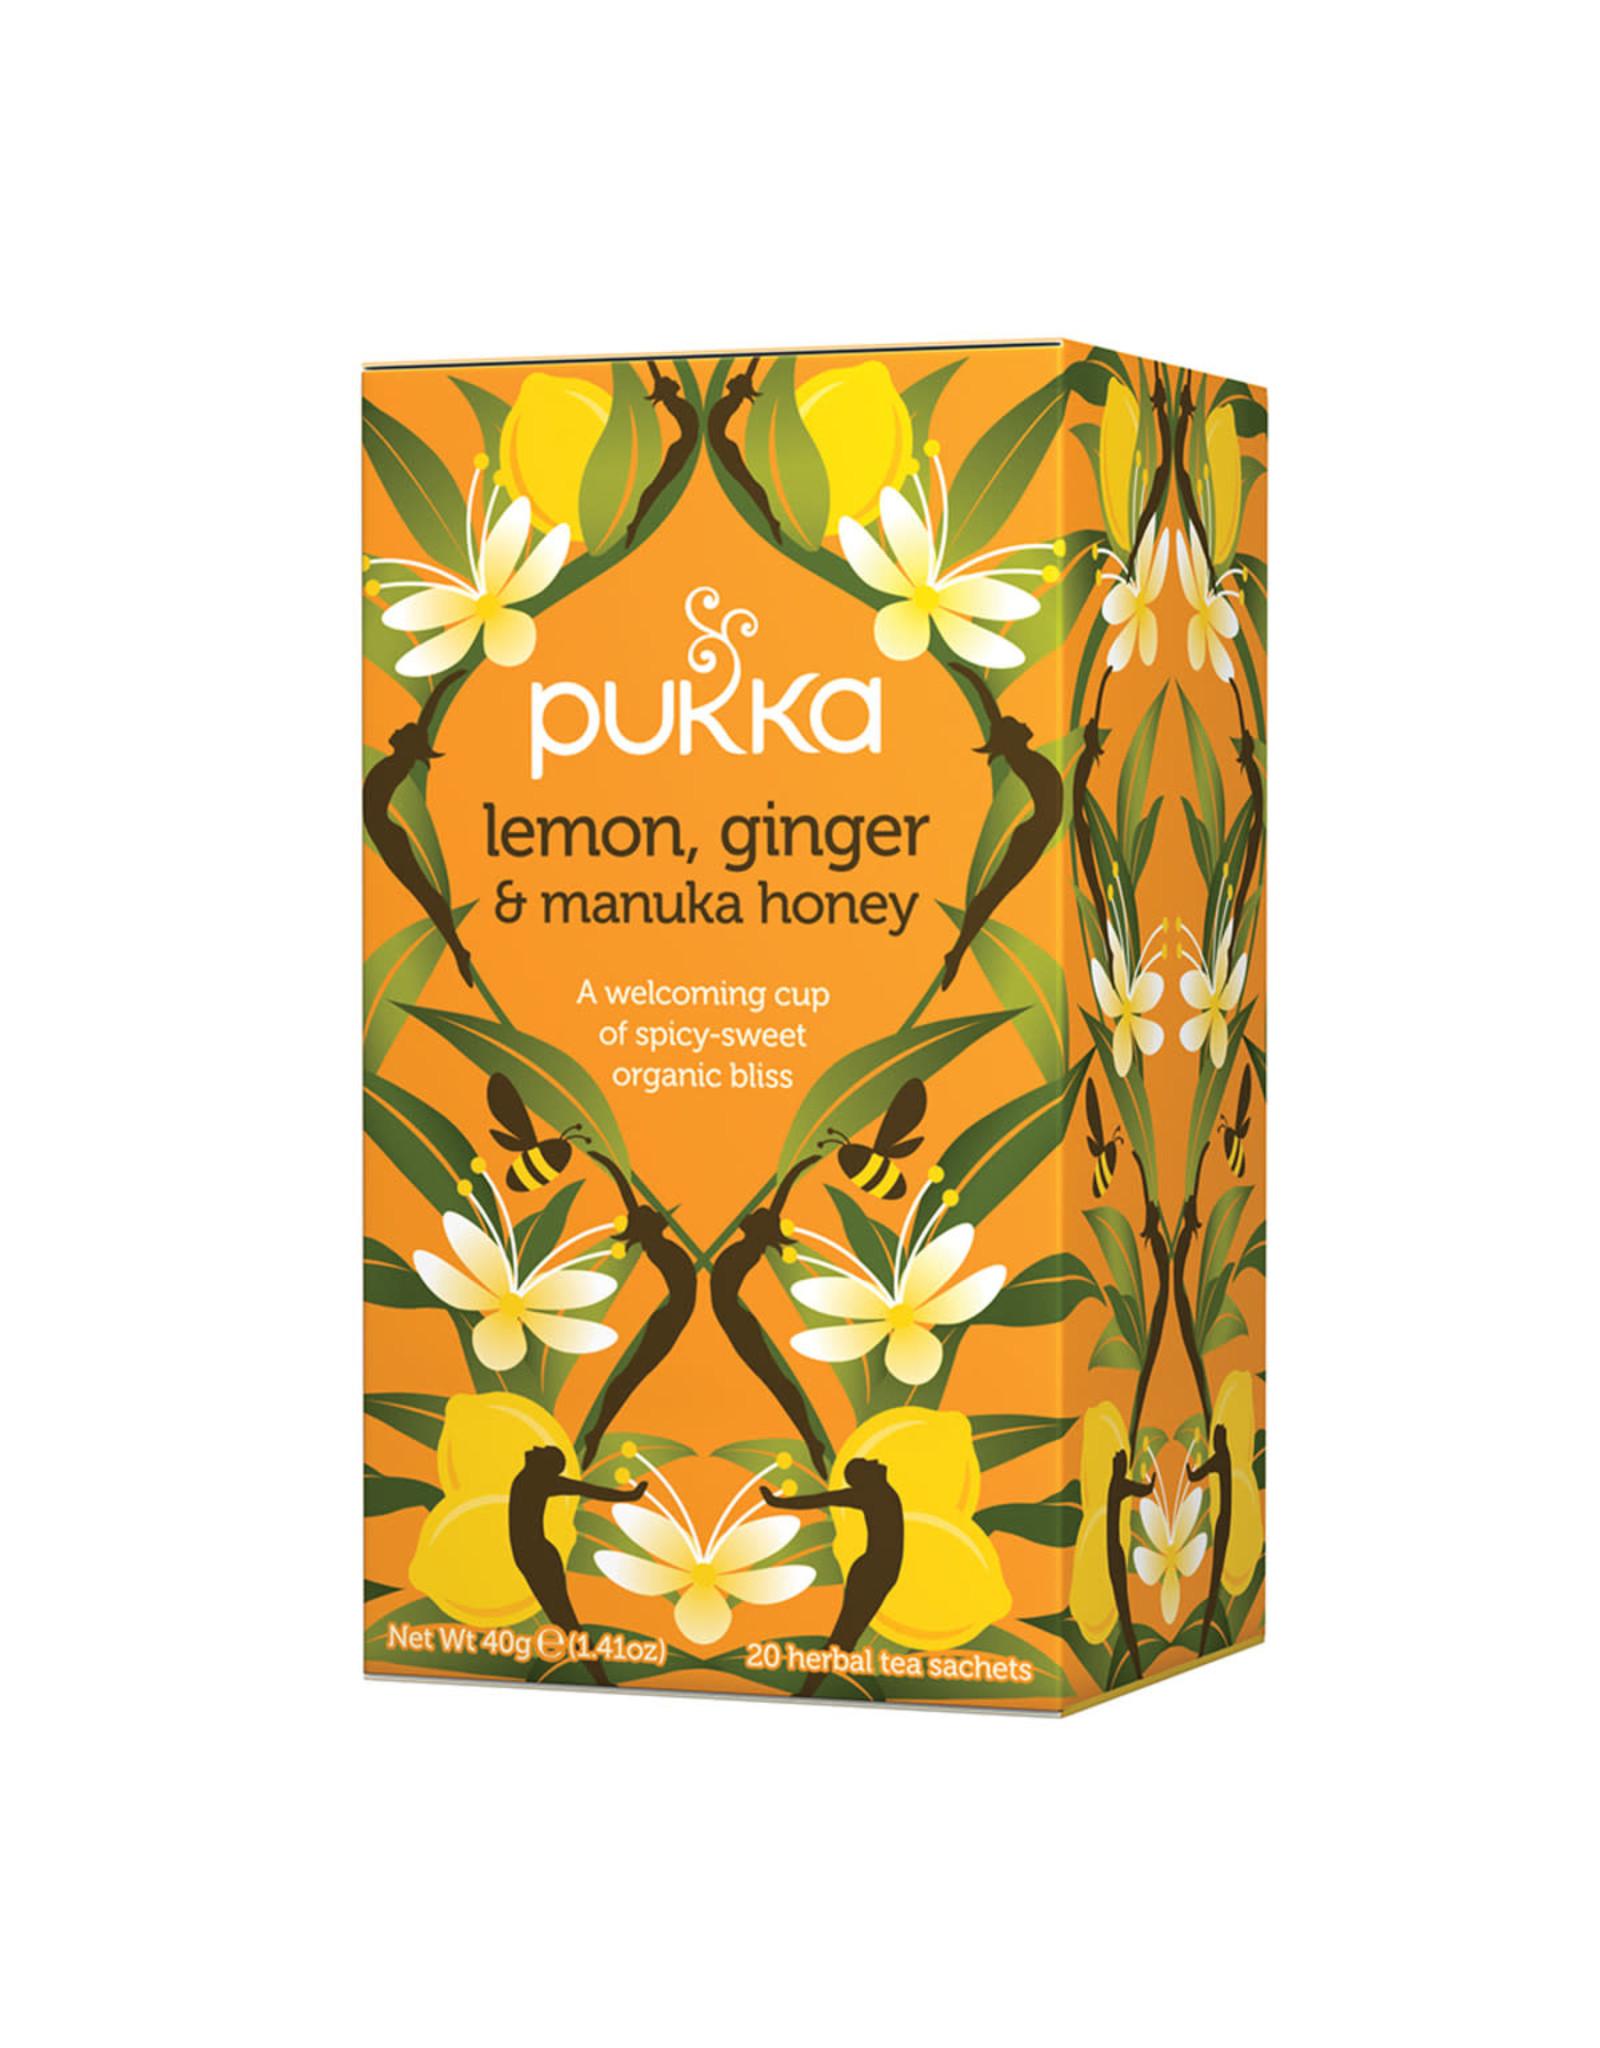 Pukka Lemon, Ginger & Manuka Honey x 20 Tea Bags